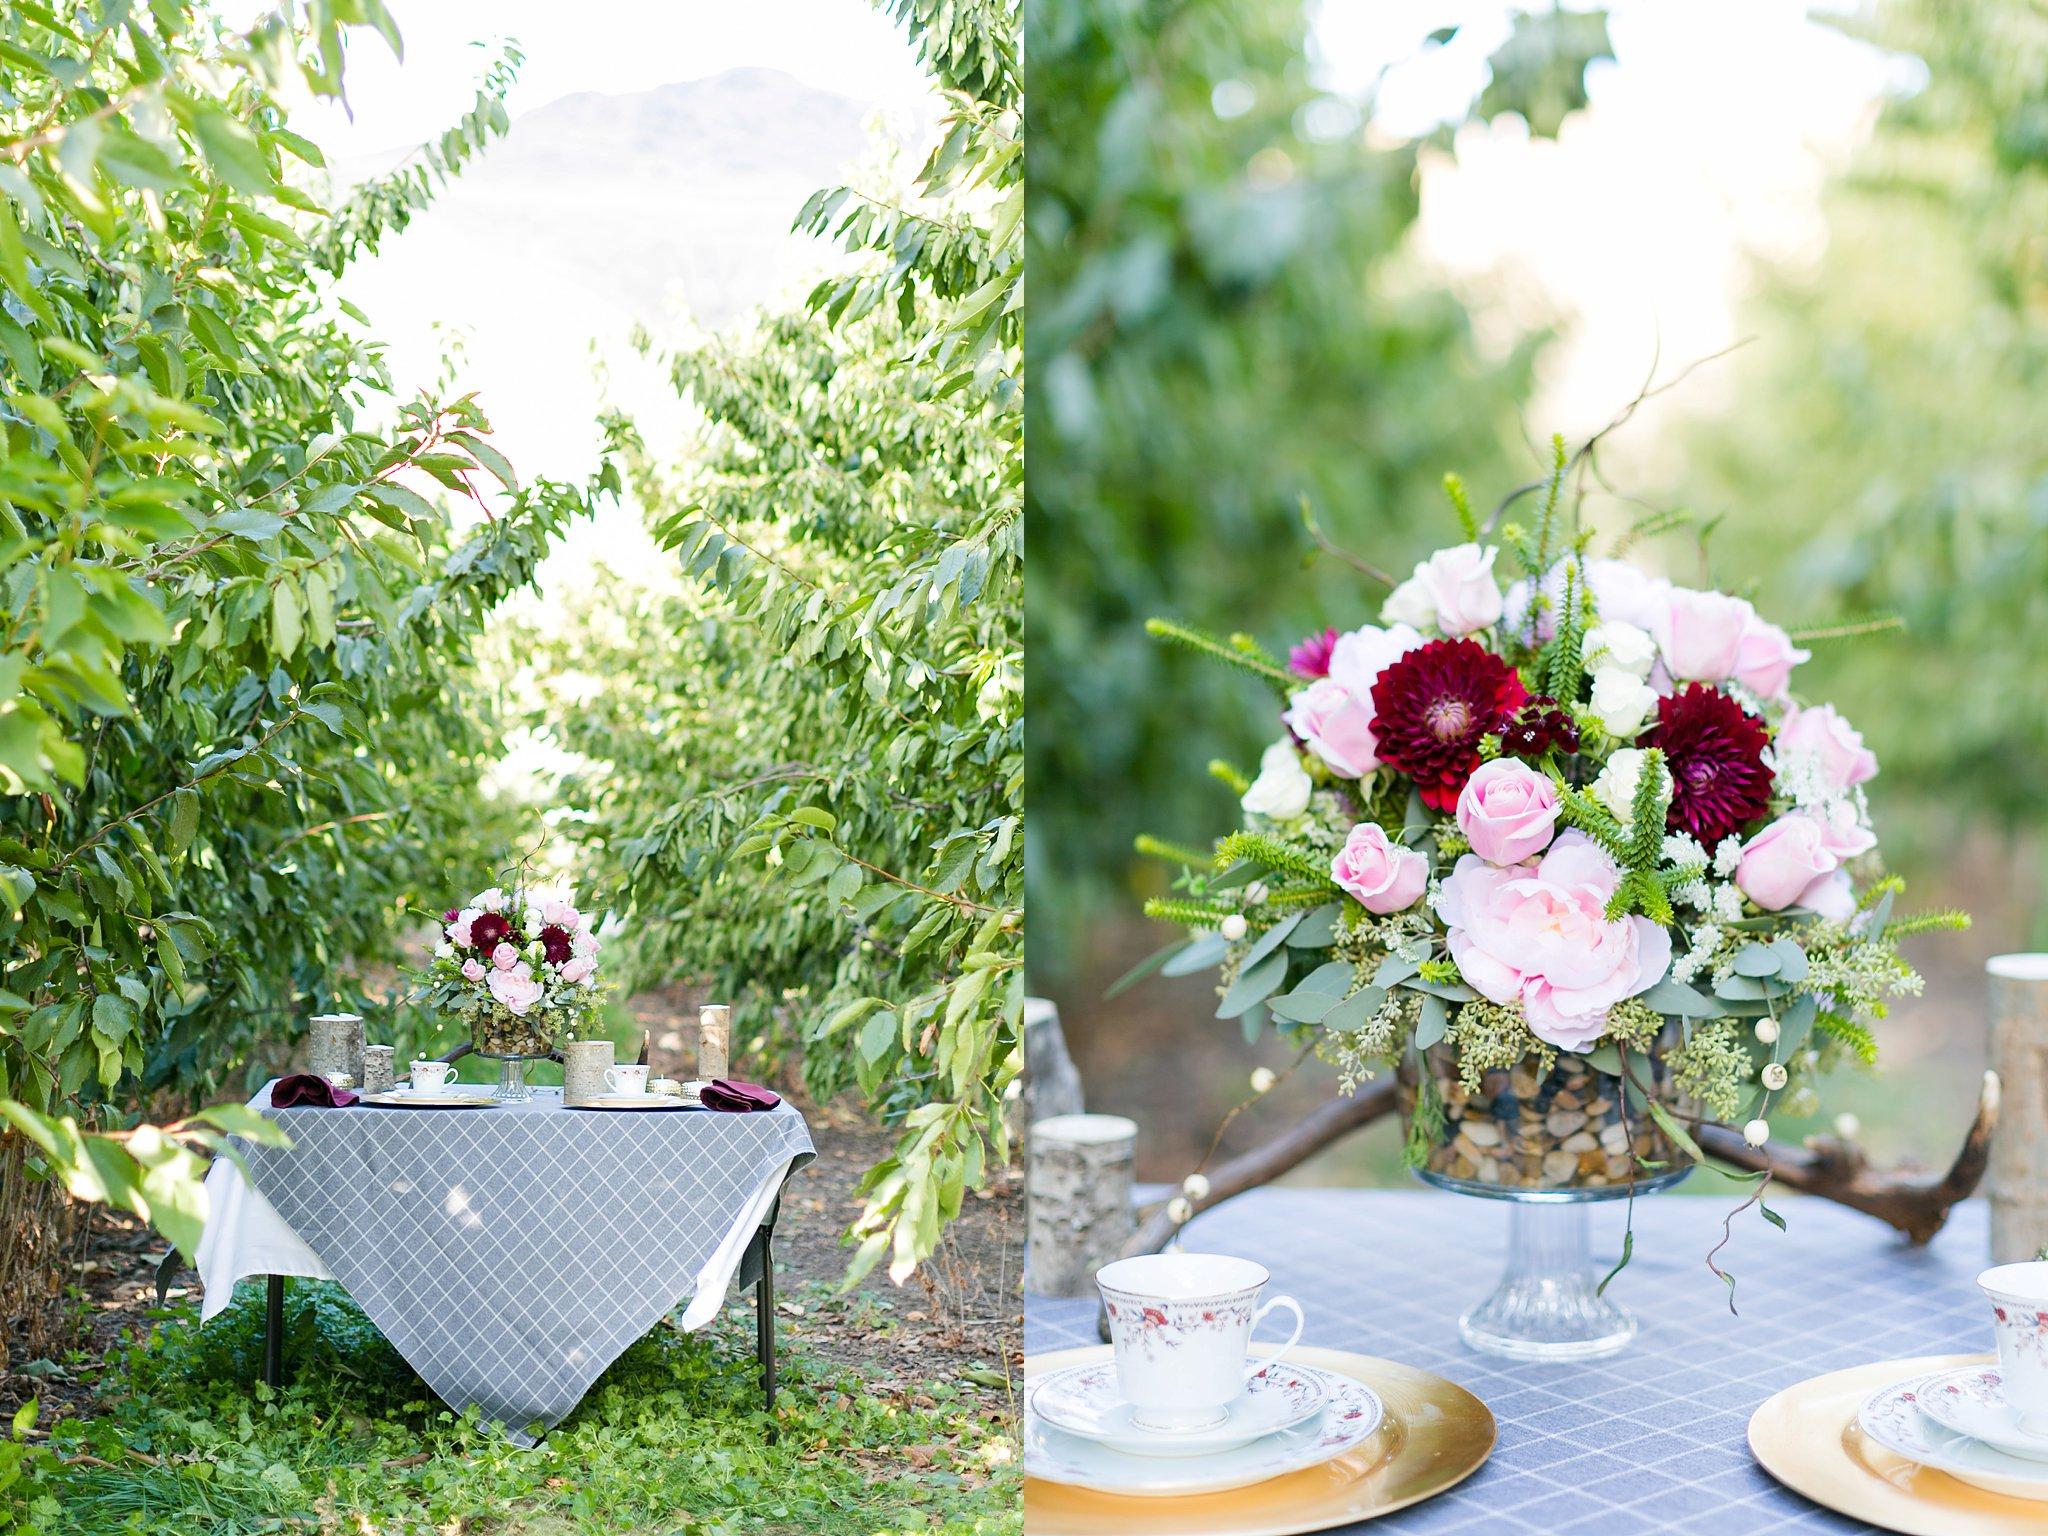 Chelan Washington Wedding Photos Megan Kelsey Photography Delight Wedding Workshop Styled Shoot Annalee & Scot-5.jpg